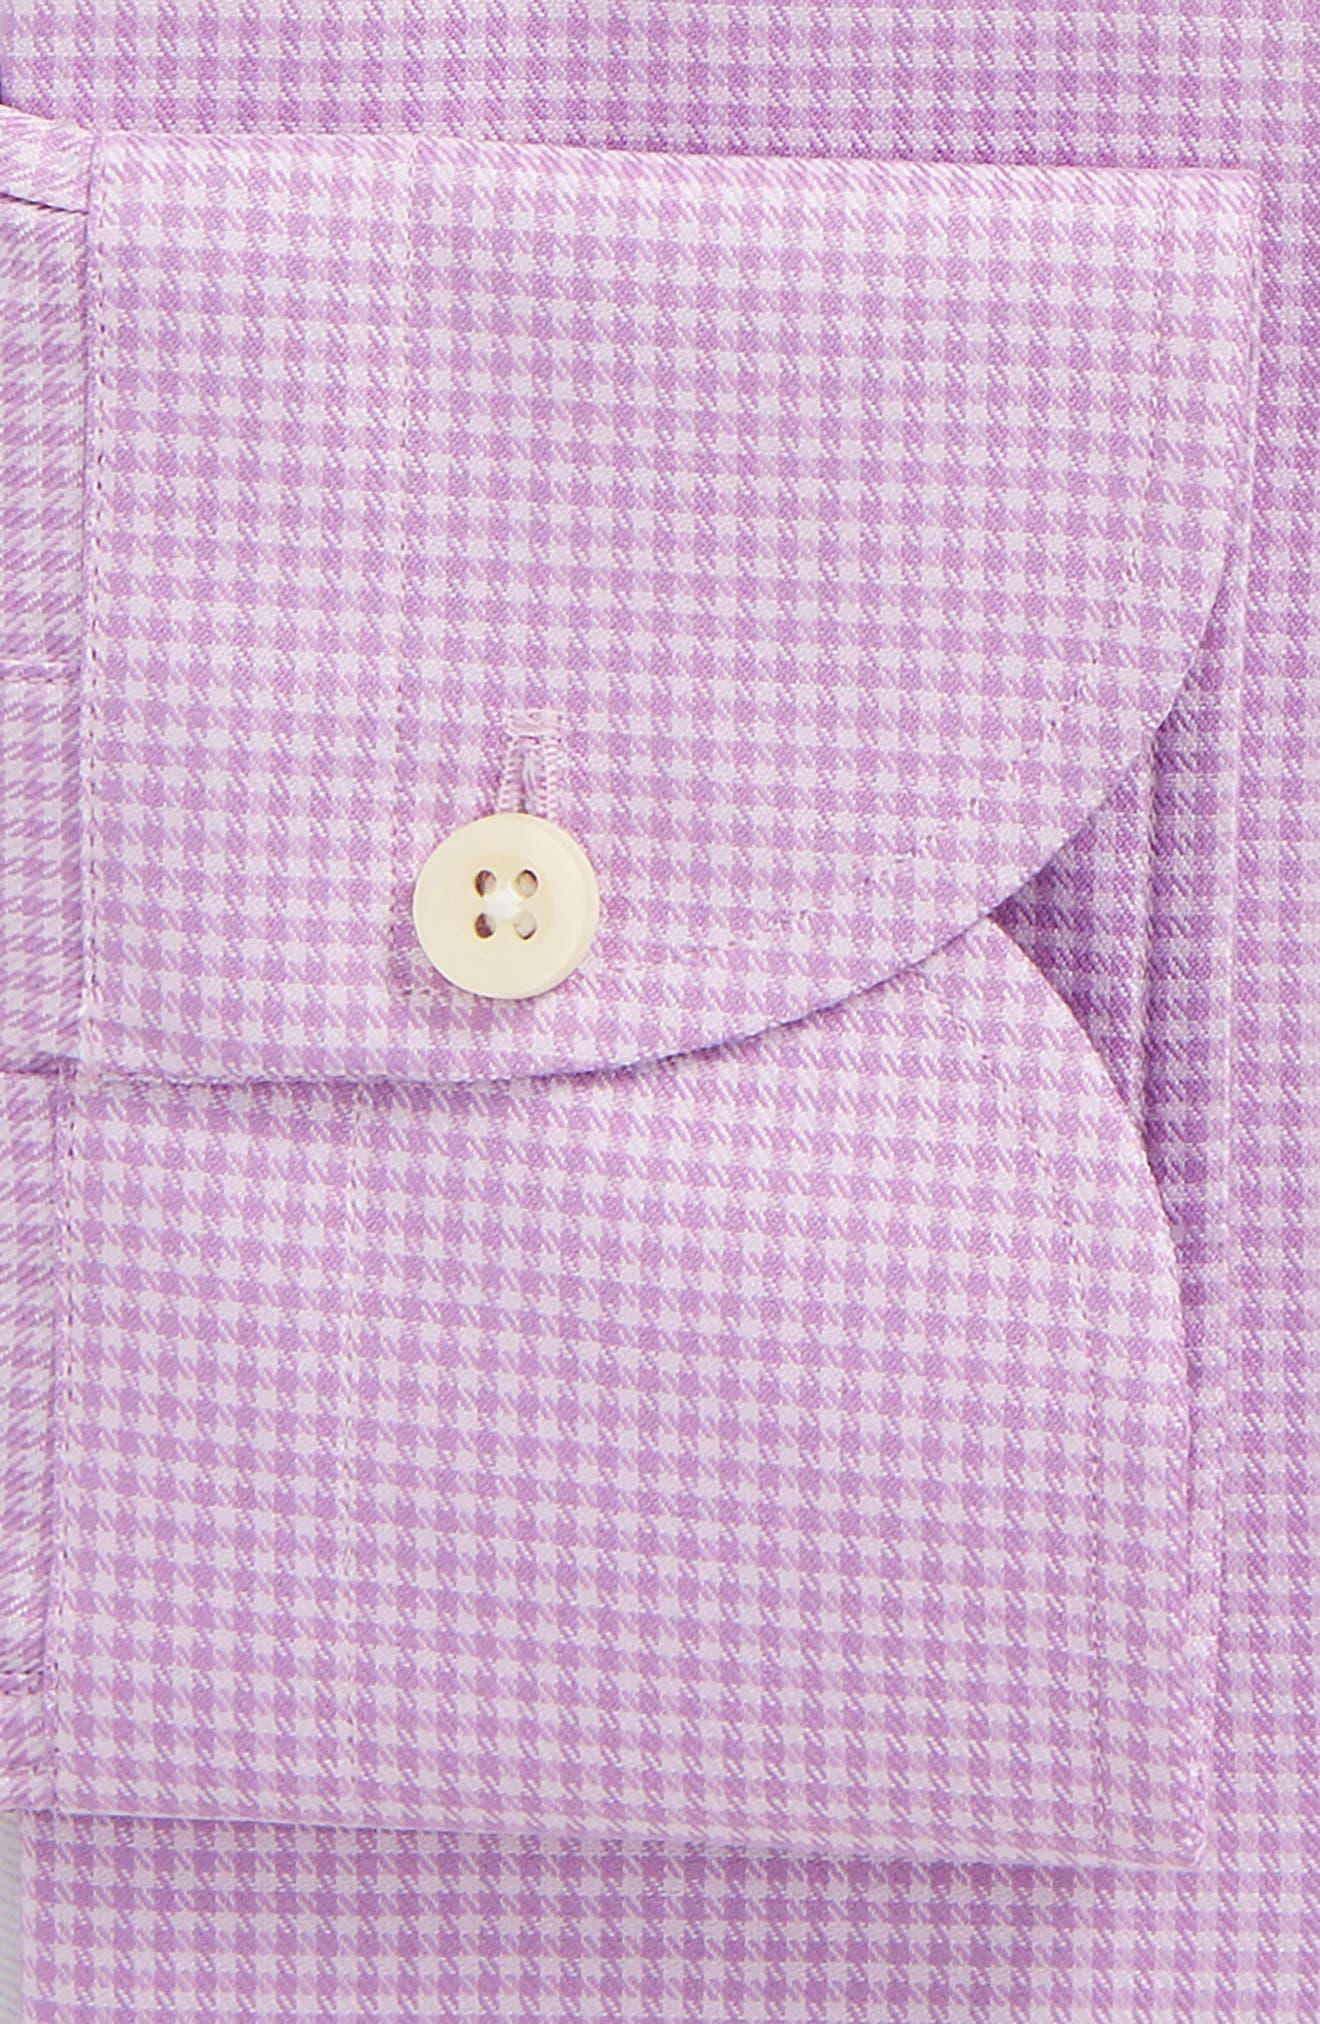 Innis Slim Fit Check Dress Shirt,                             Alternate thumbnail 5, color,                             Lilac